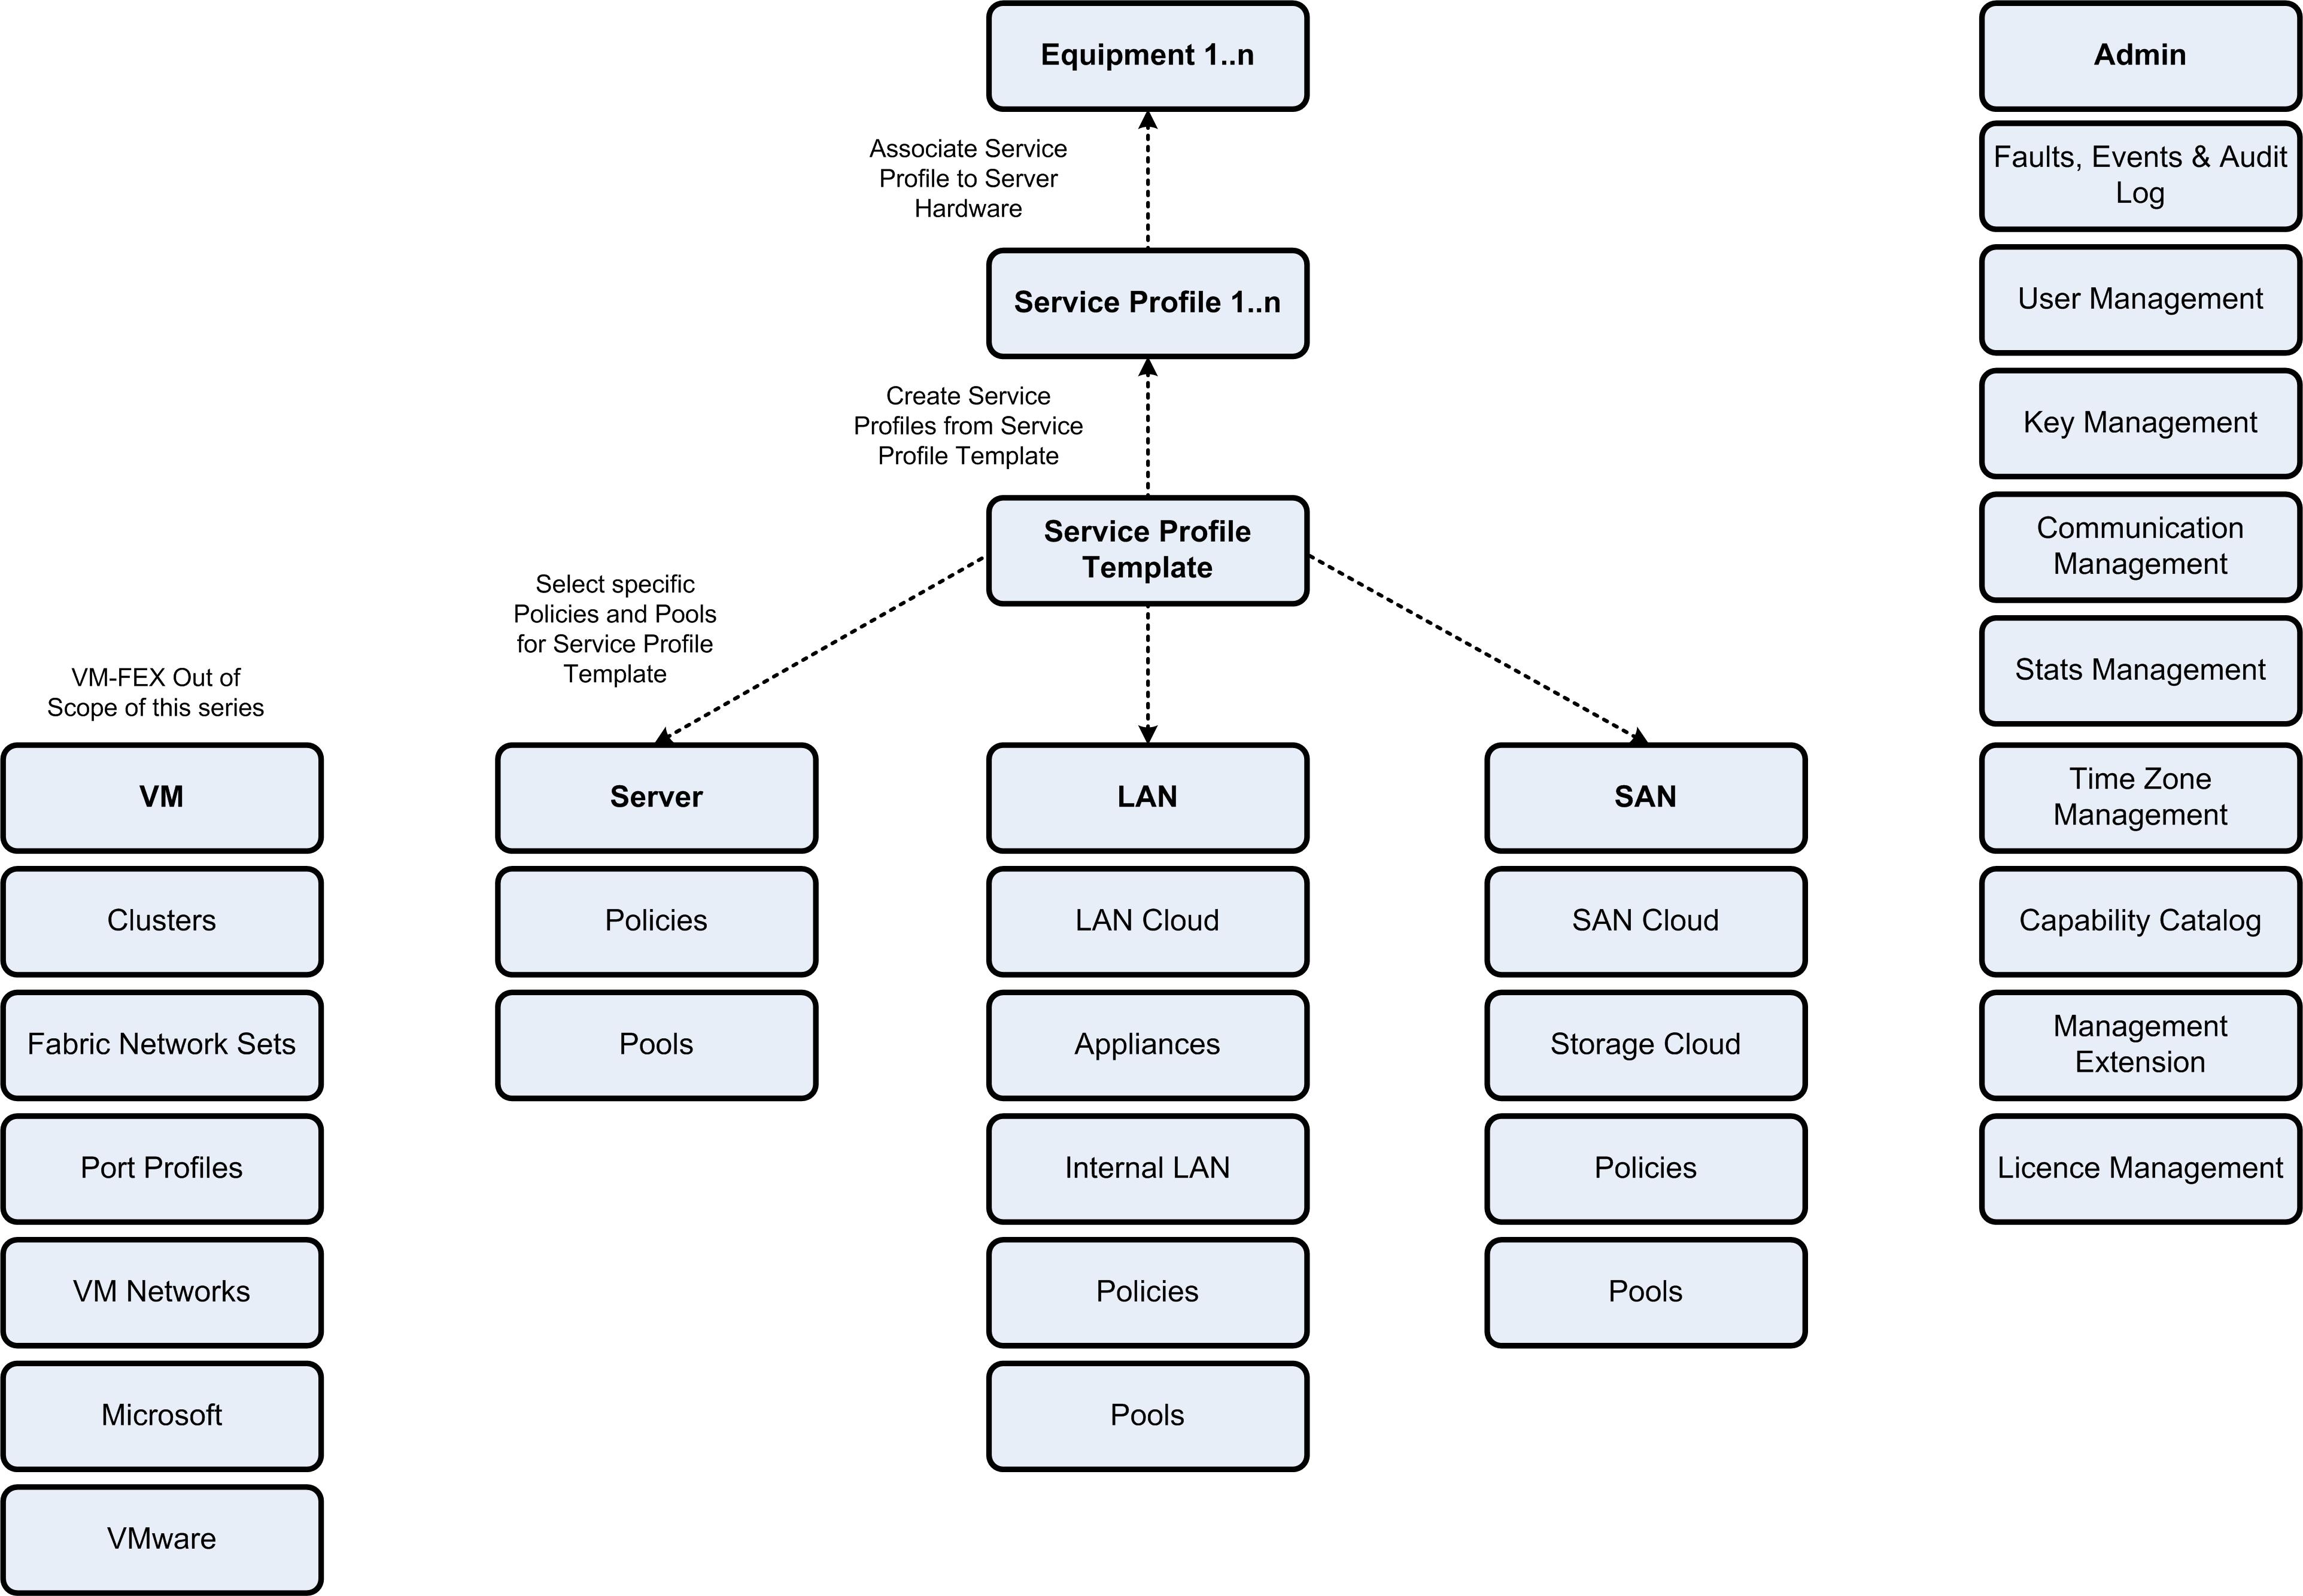 cisco ucs configuration guide for vsphere part 1 overview rh vcdx133 com cisco ucs director admin guide cisco ucs director administration guide